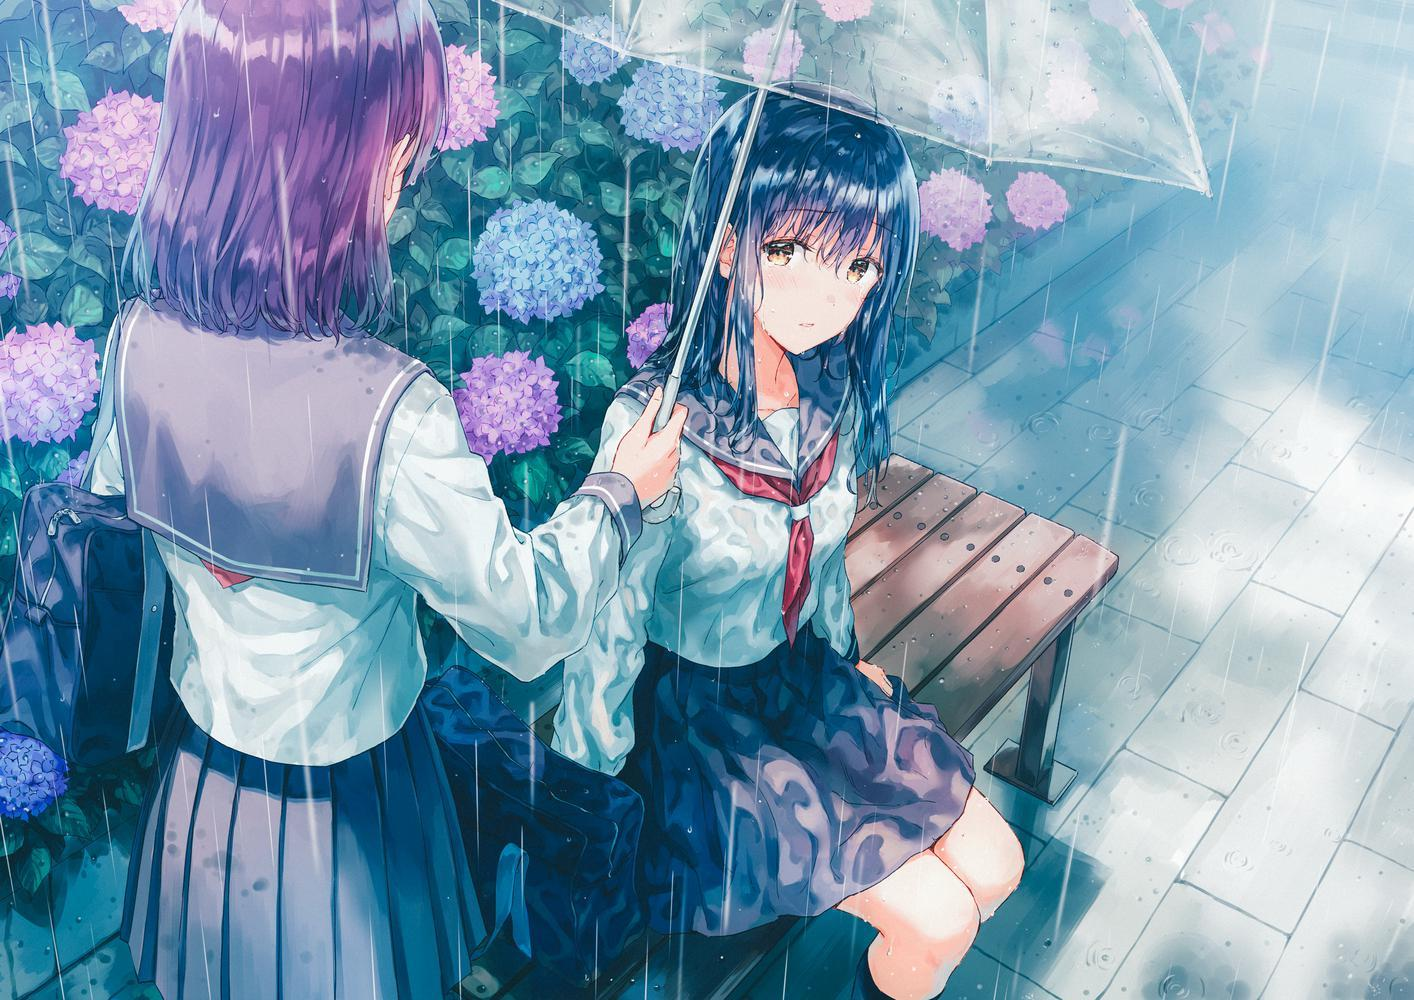 P站画师作品rainy day